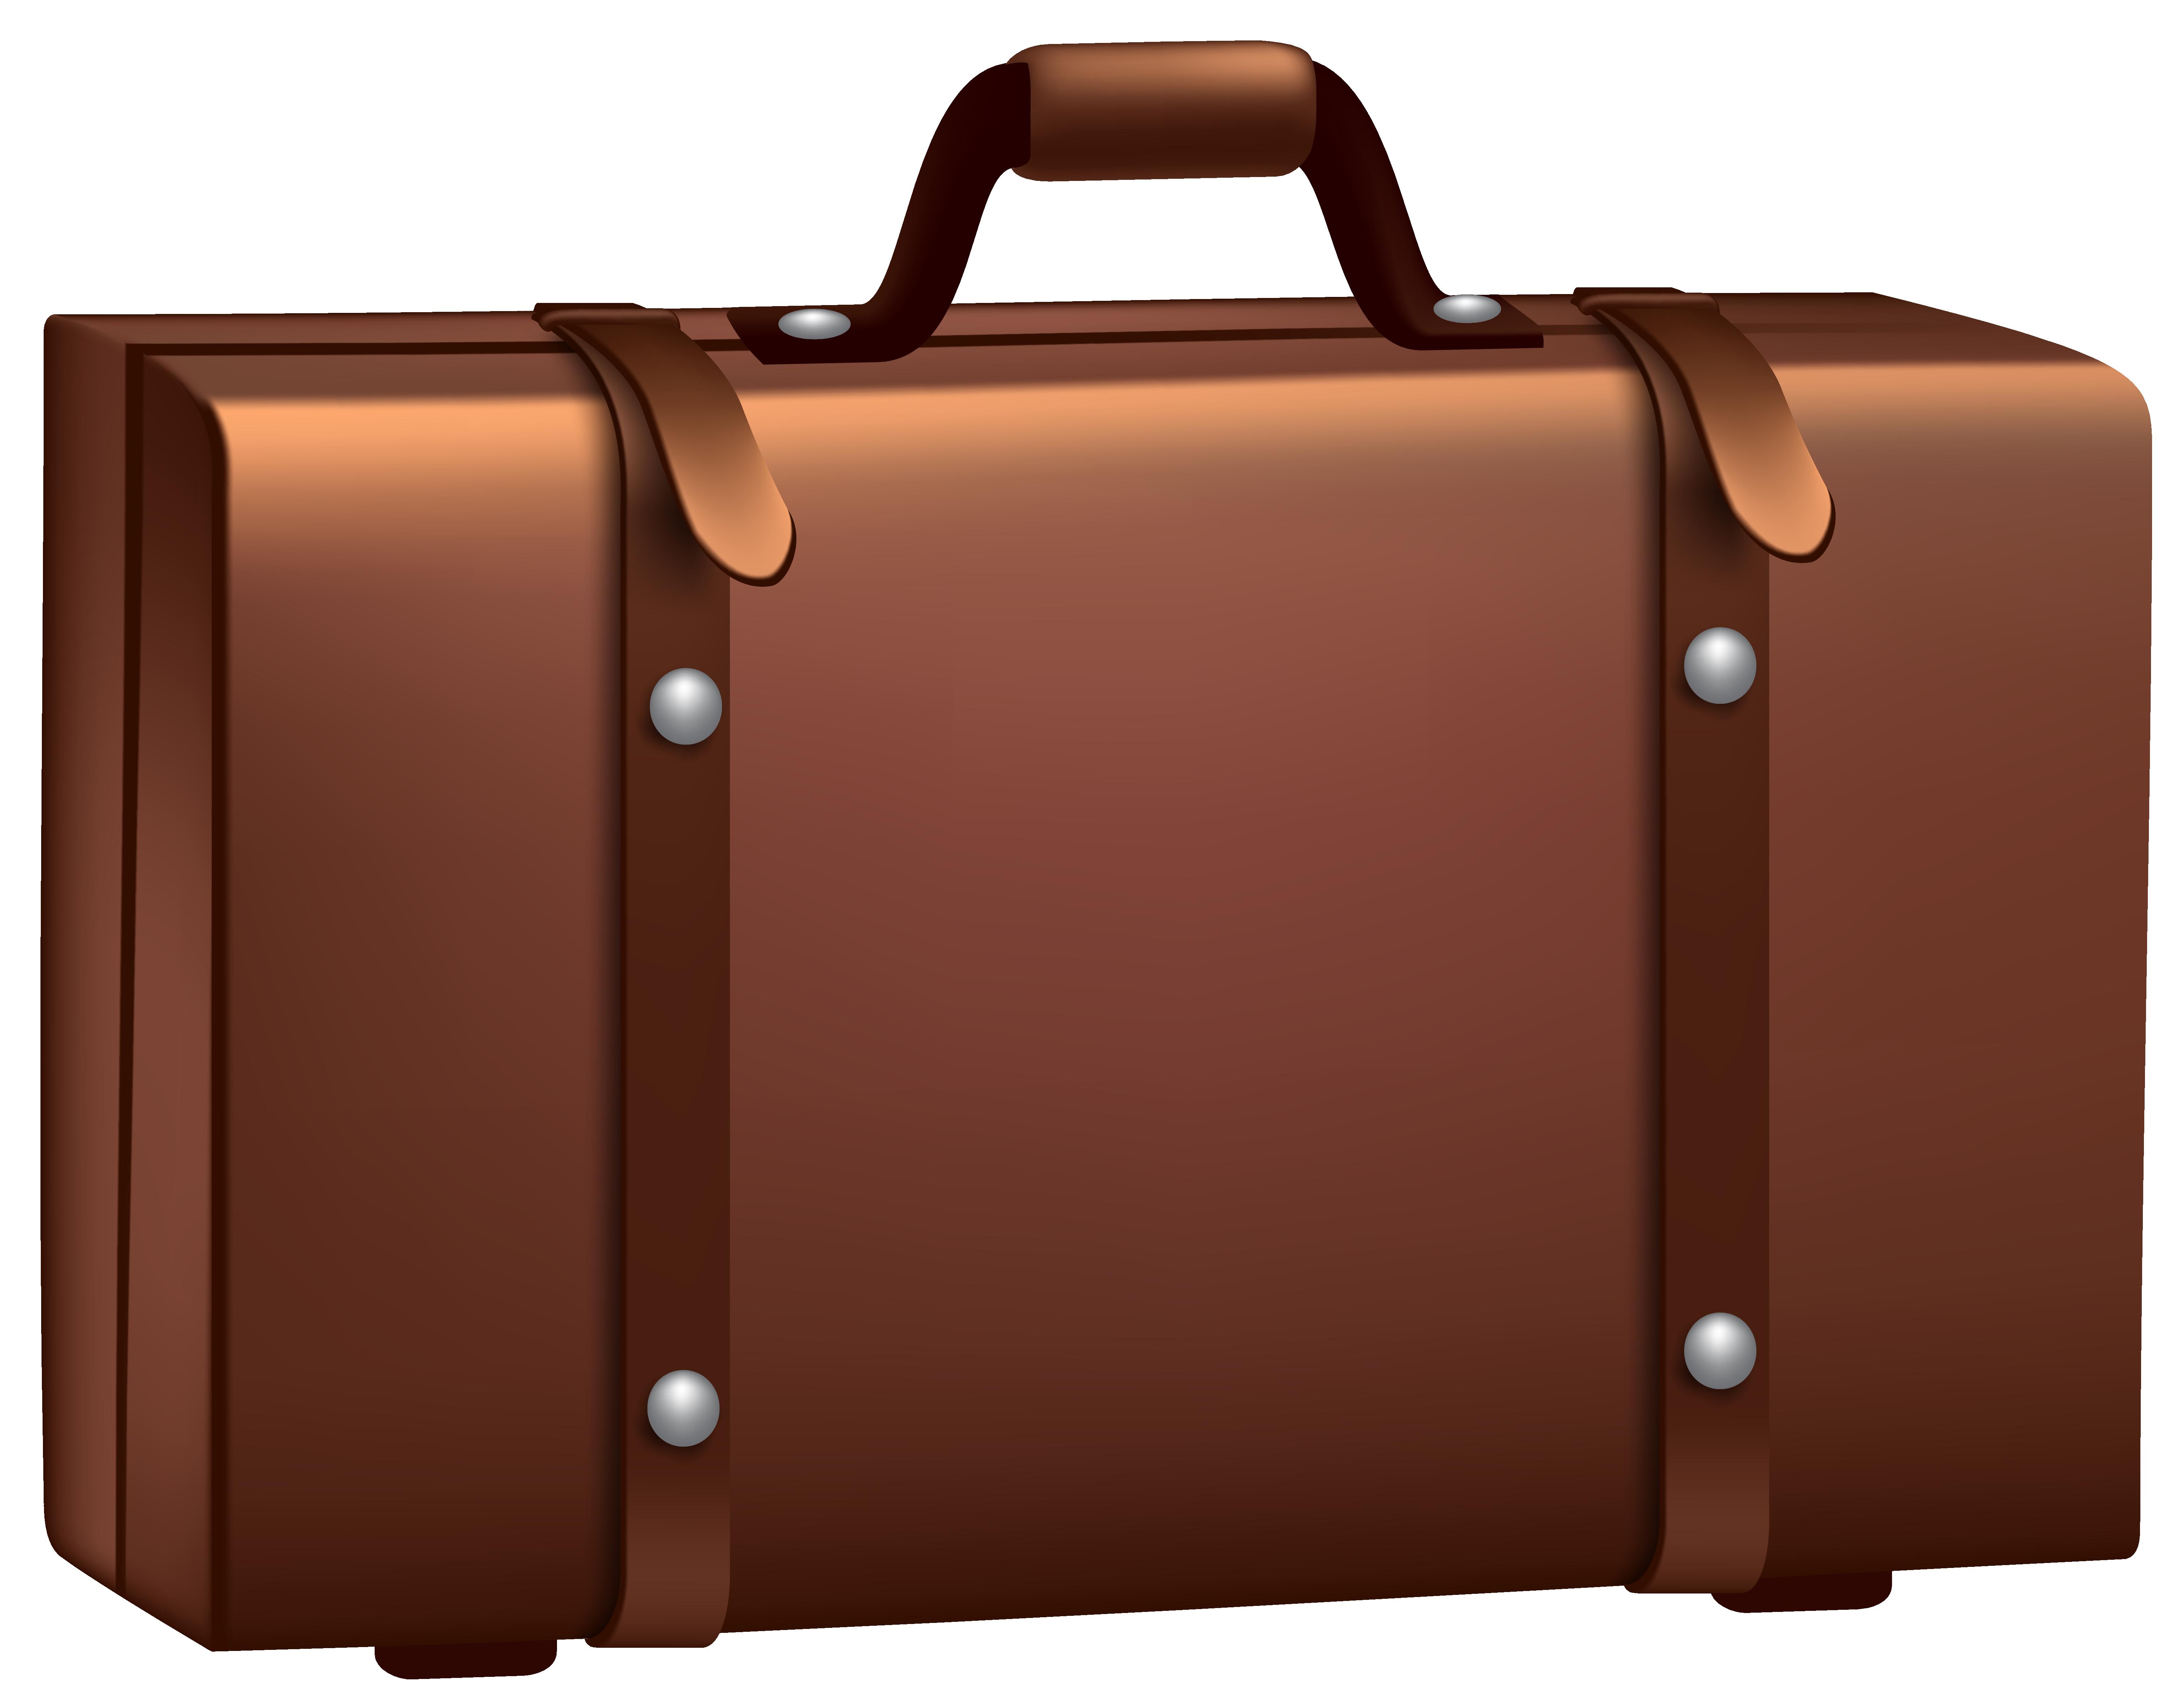 Cartoon suitcase clipart.